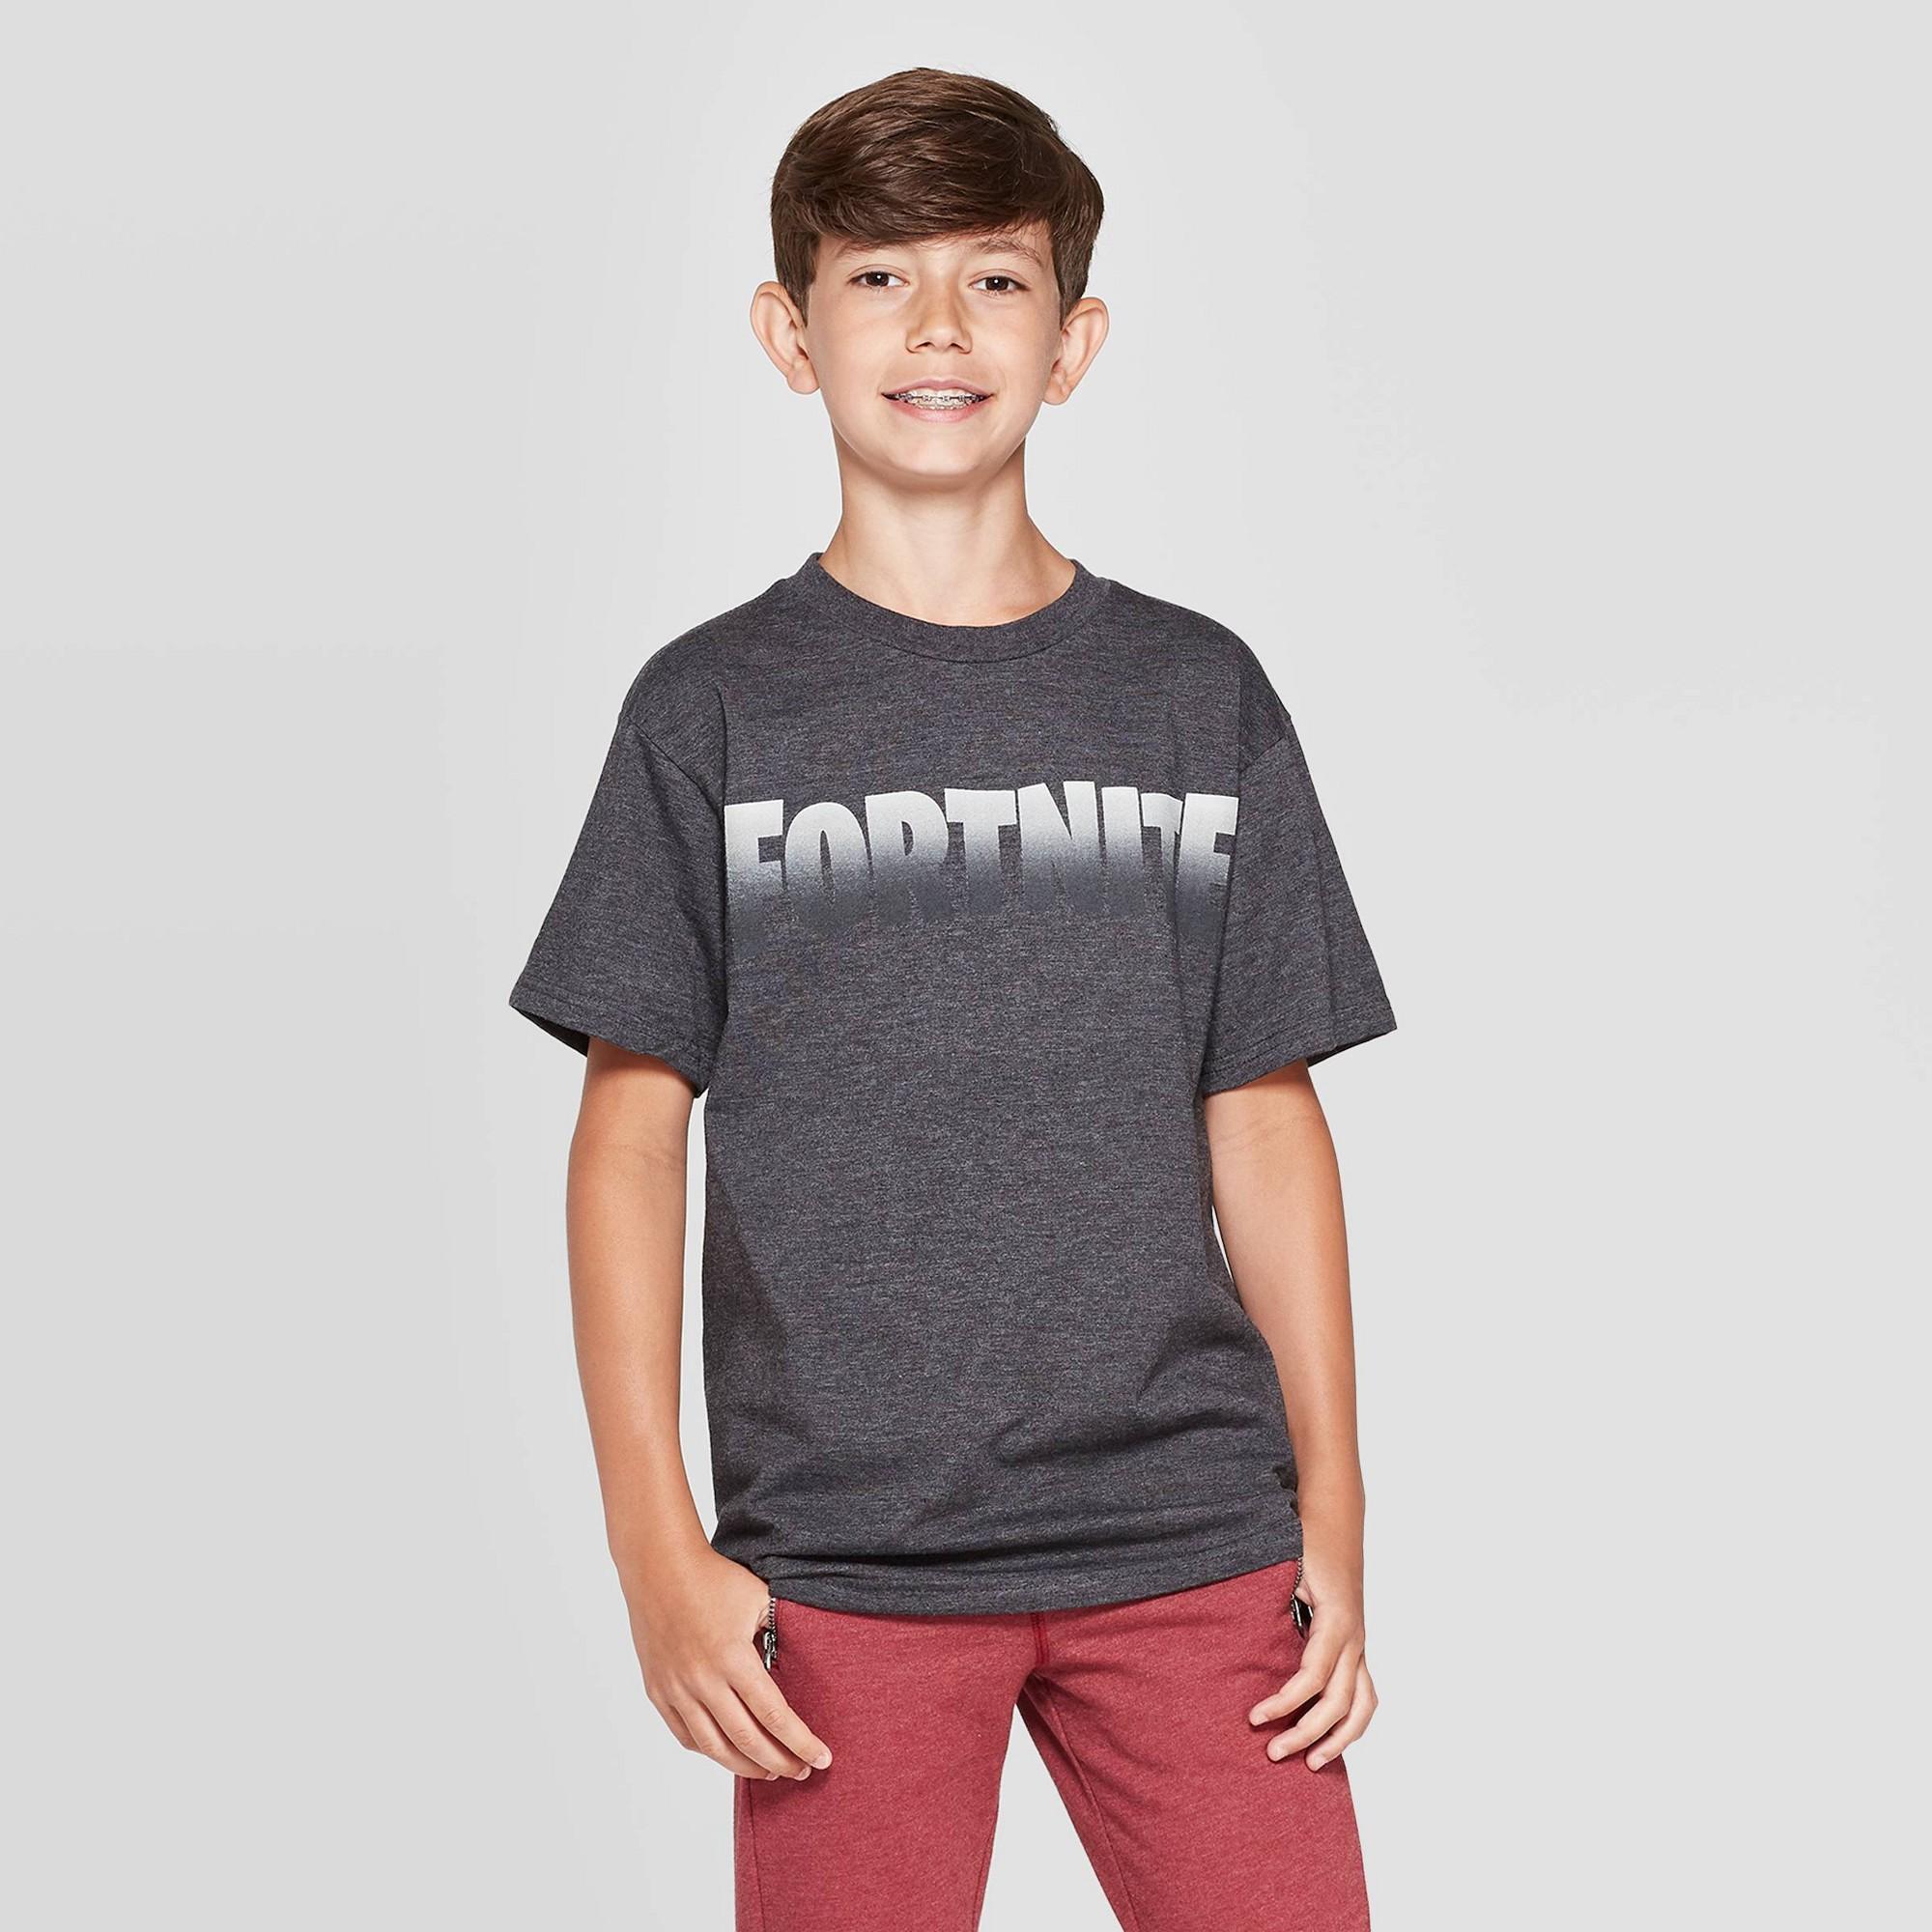 Boys' Fortnite Logo-6 Short Sleeve T-Shirt - Charcoal Heather M, Gray